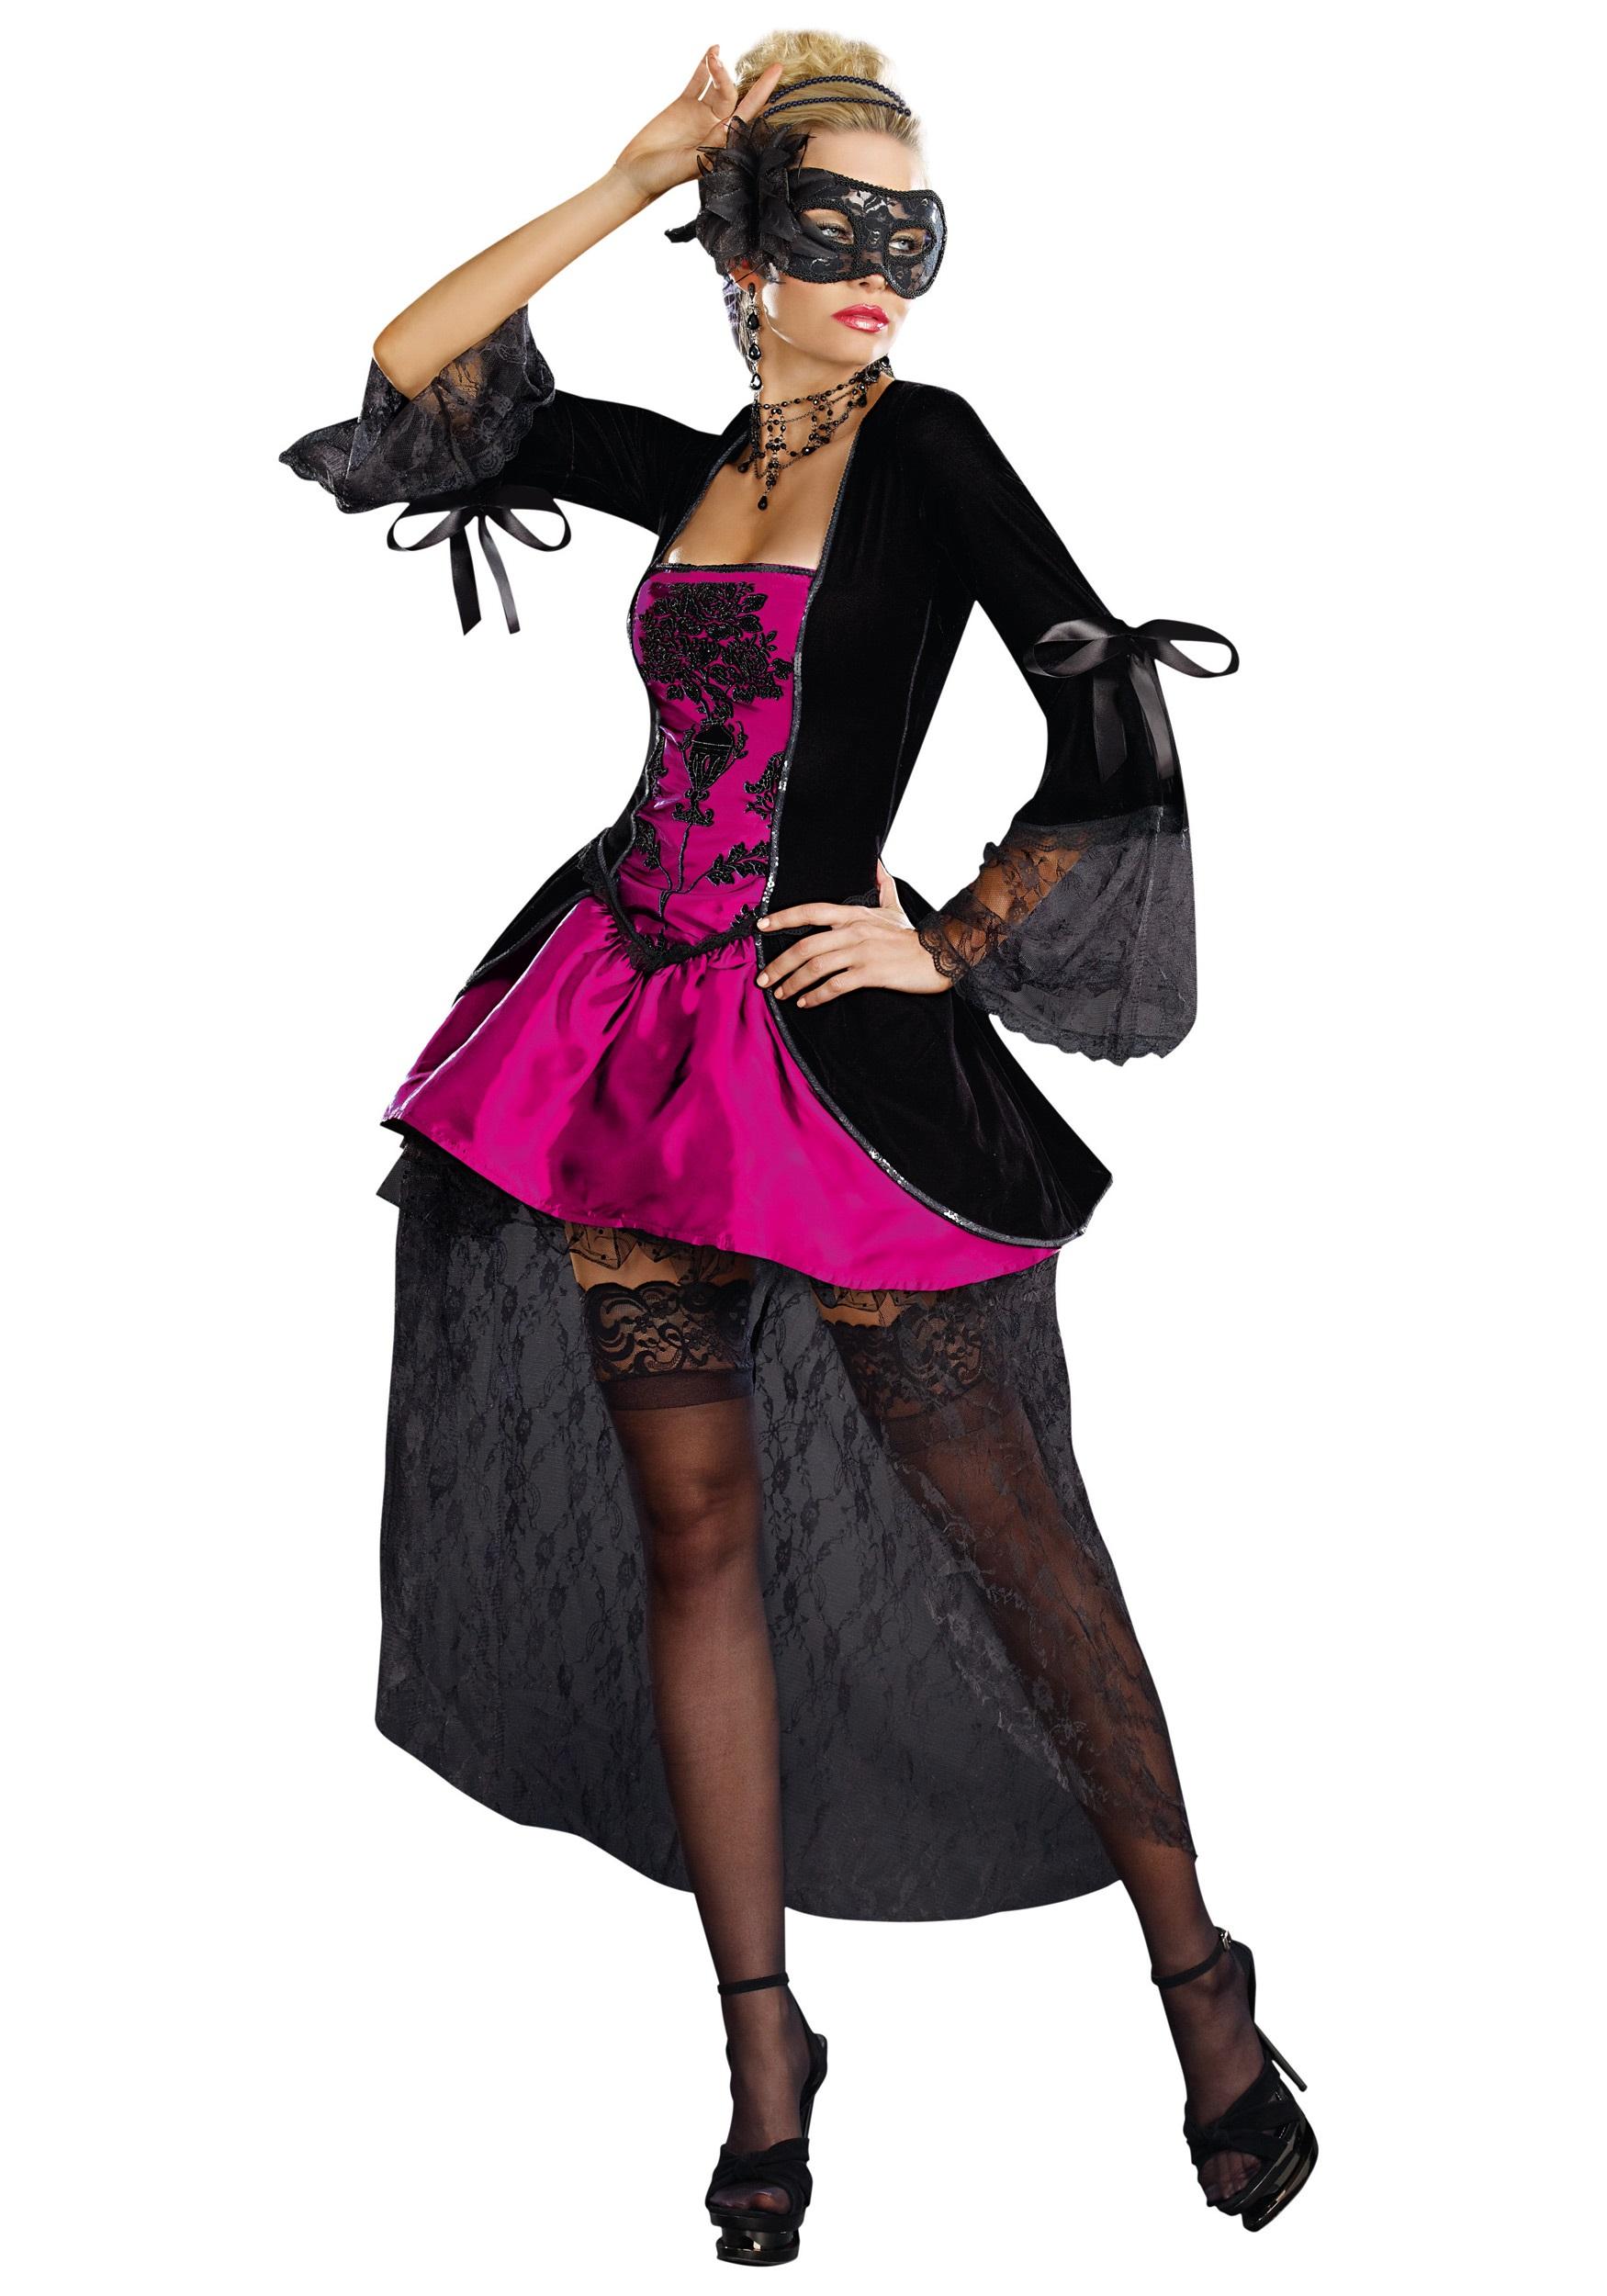 Sexy Venetian Masquerade Costume  sc 1 st  Halloween Costumes & Sexy Venetian Masquerade Costume - Halloween Costumes